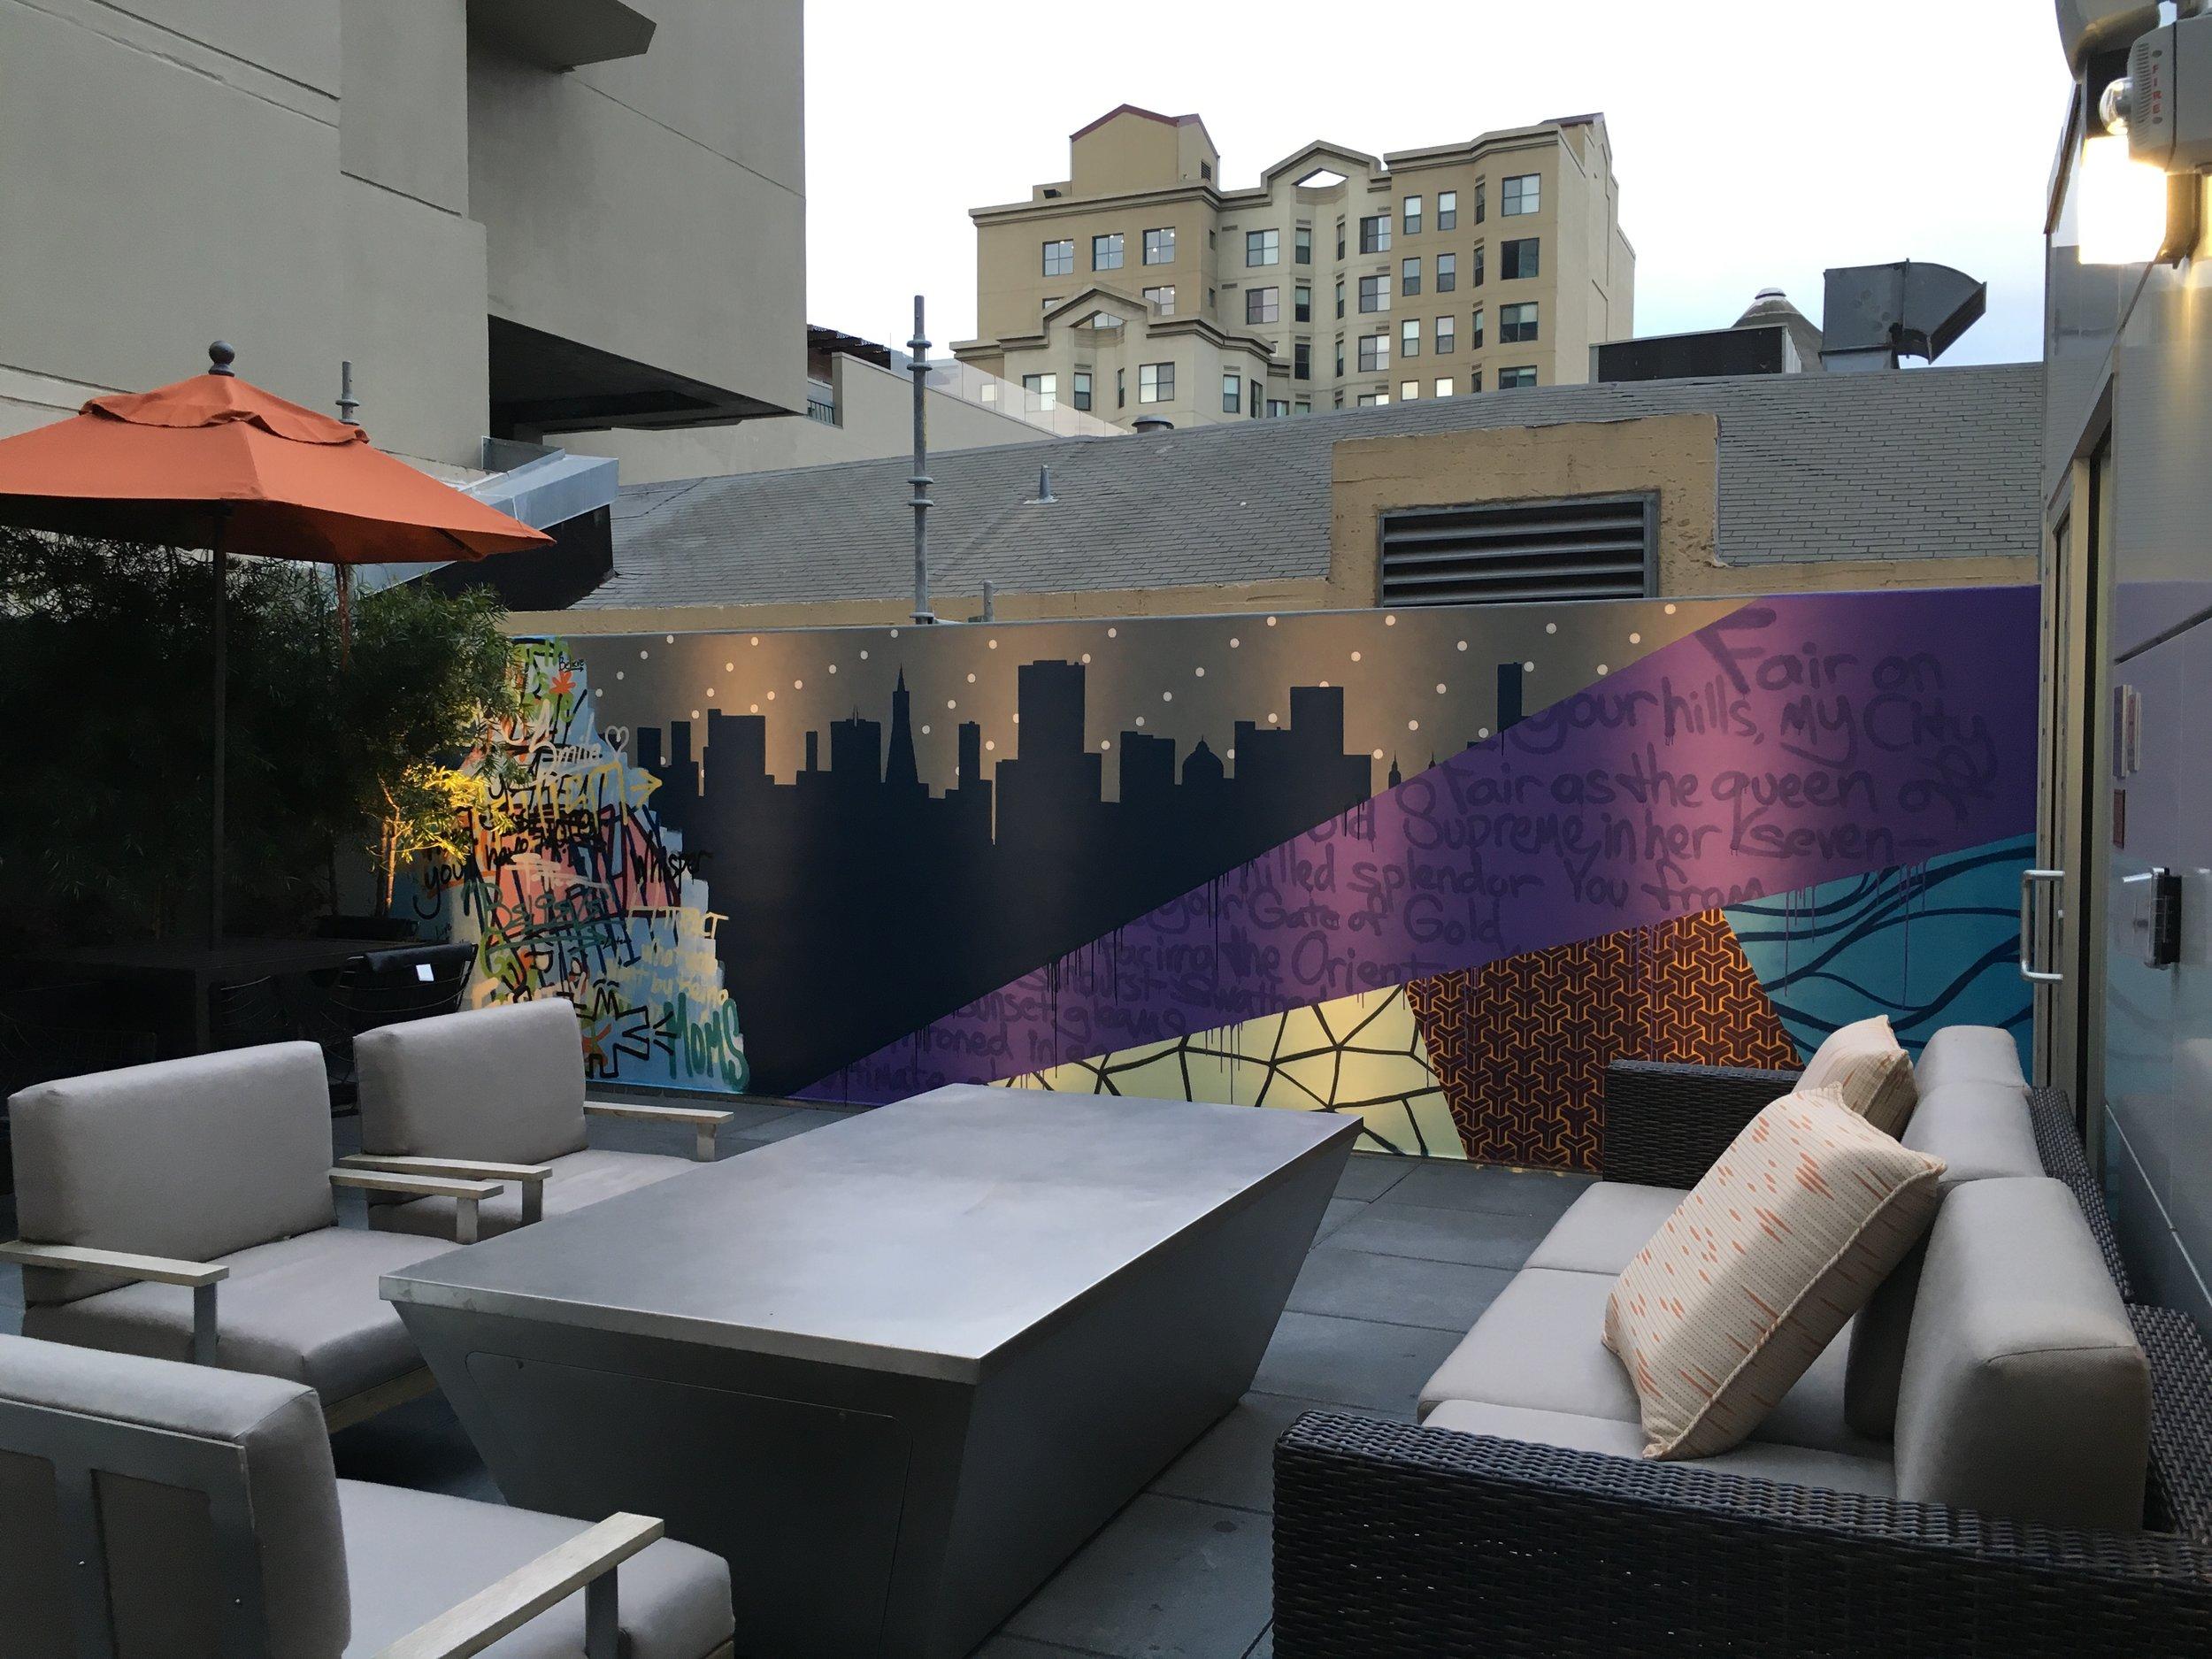 Strider Patton - Courtyard Marriott mural - San Francisco, CA 2016